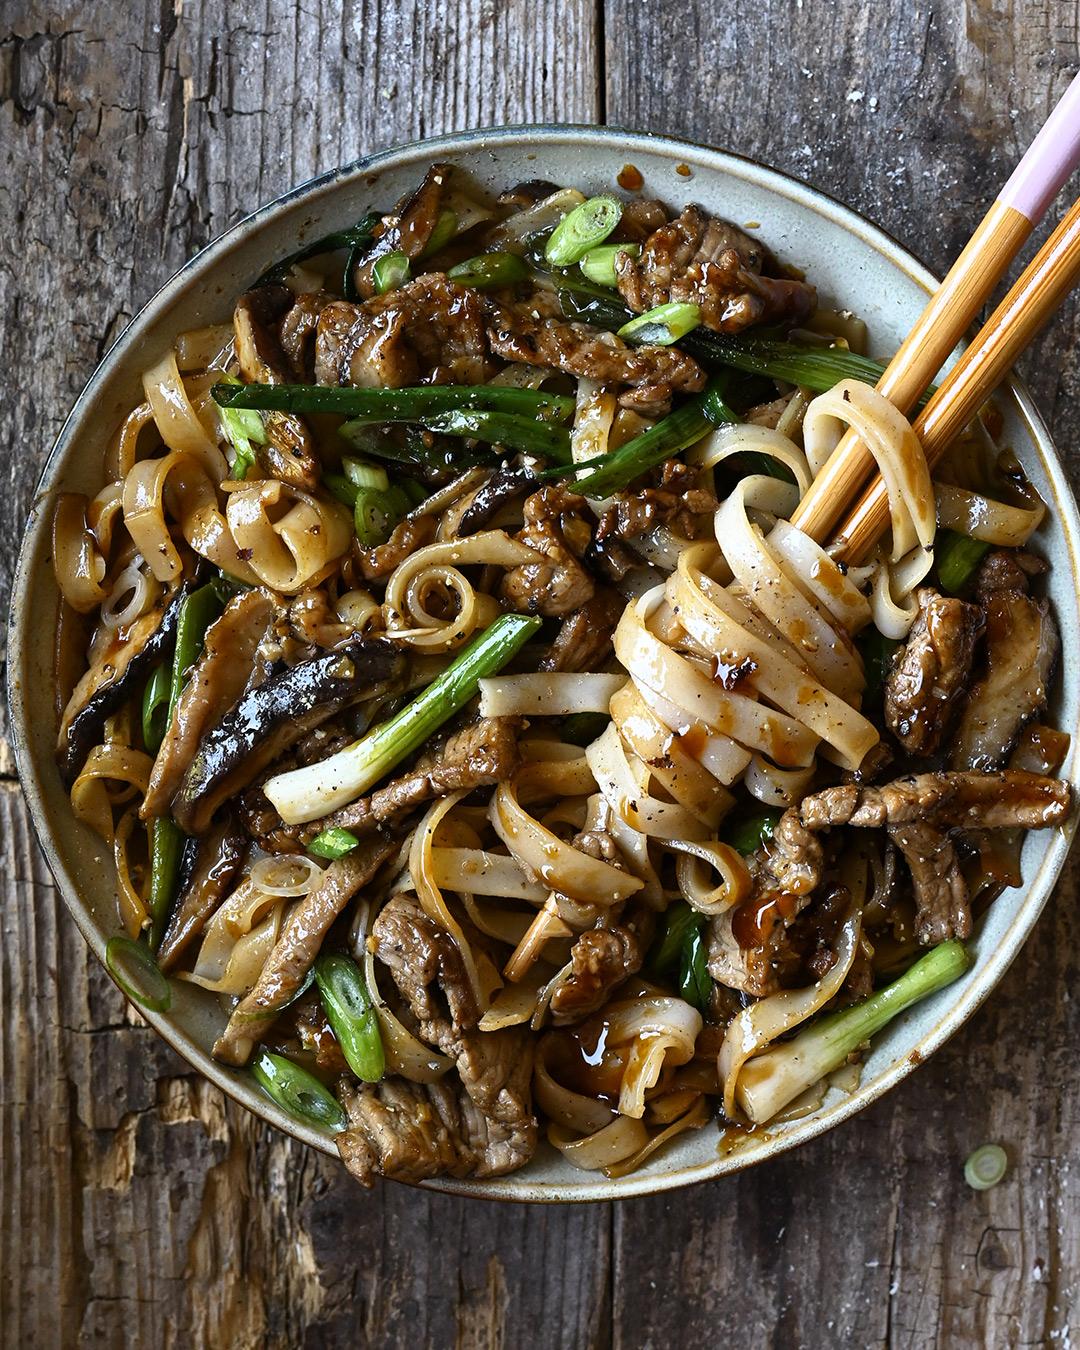 20 Minute Beef And Shiitake Noodle Stir Fry Serving Dumplings